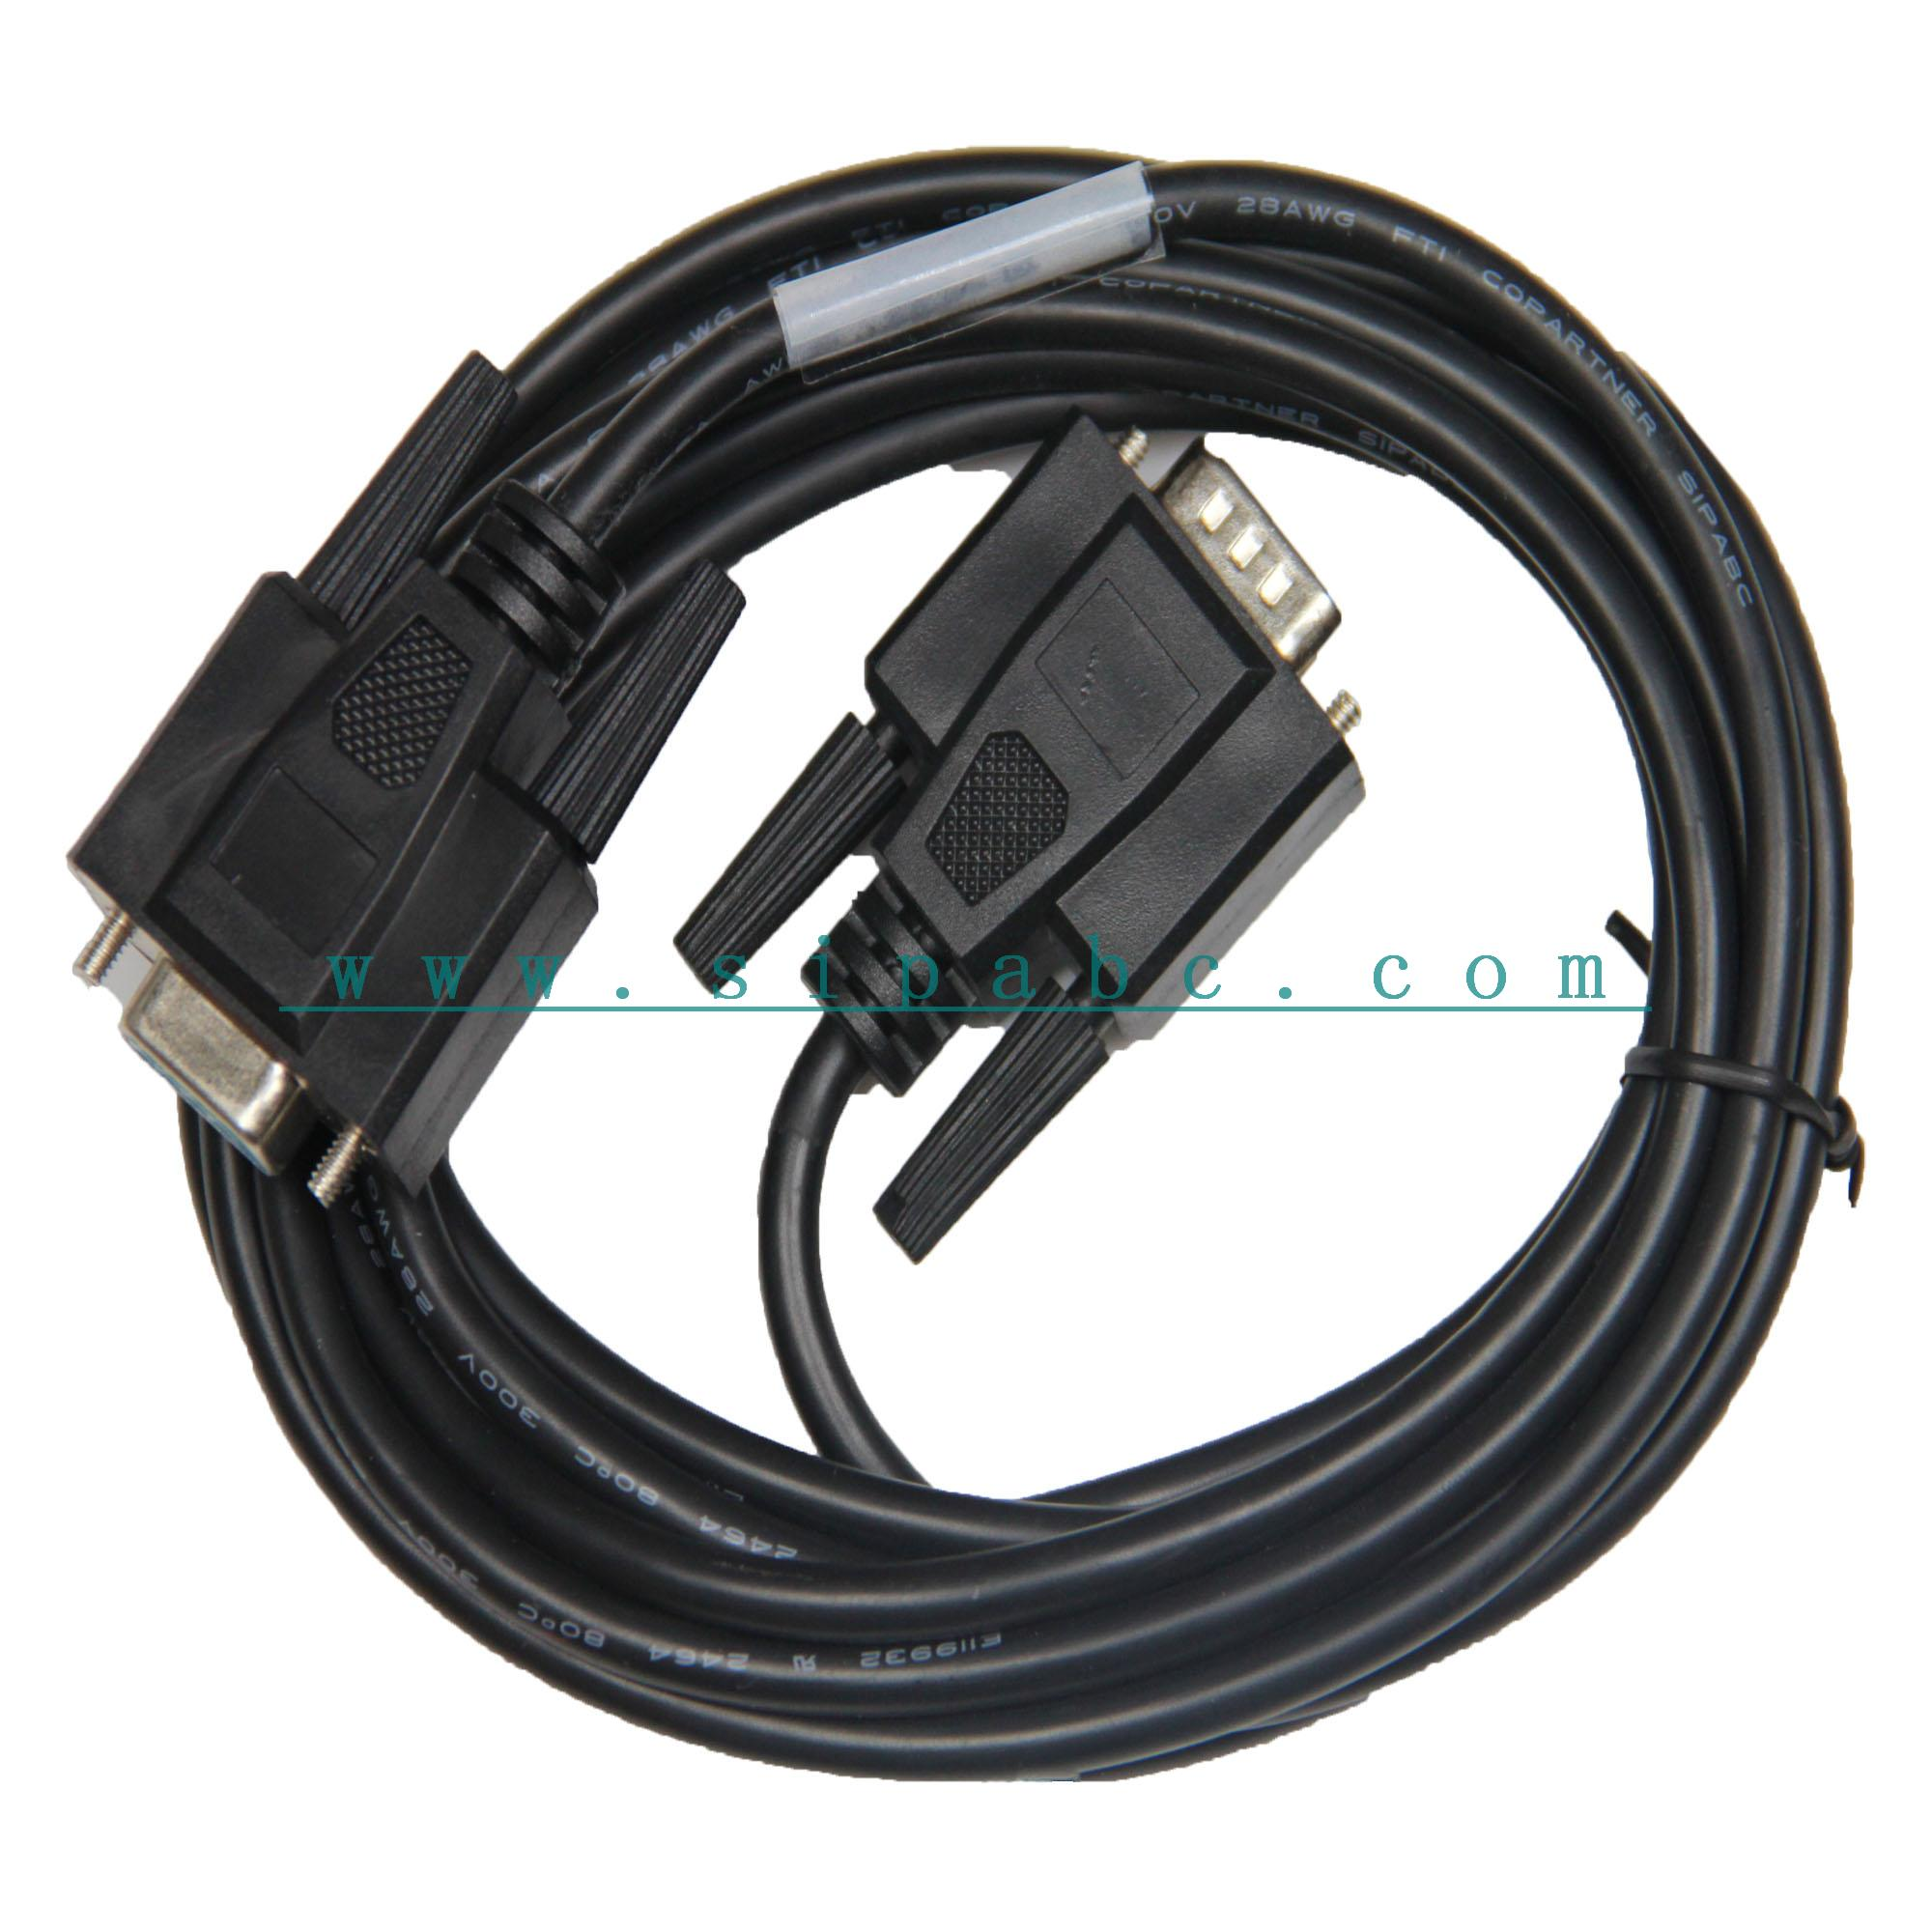 兼容6ES7 901-1BF00-0XA0 西门子TP270触摸屏编程电缆 DB9F-DB9F